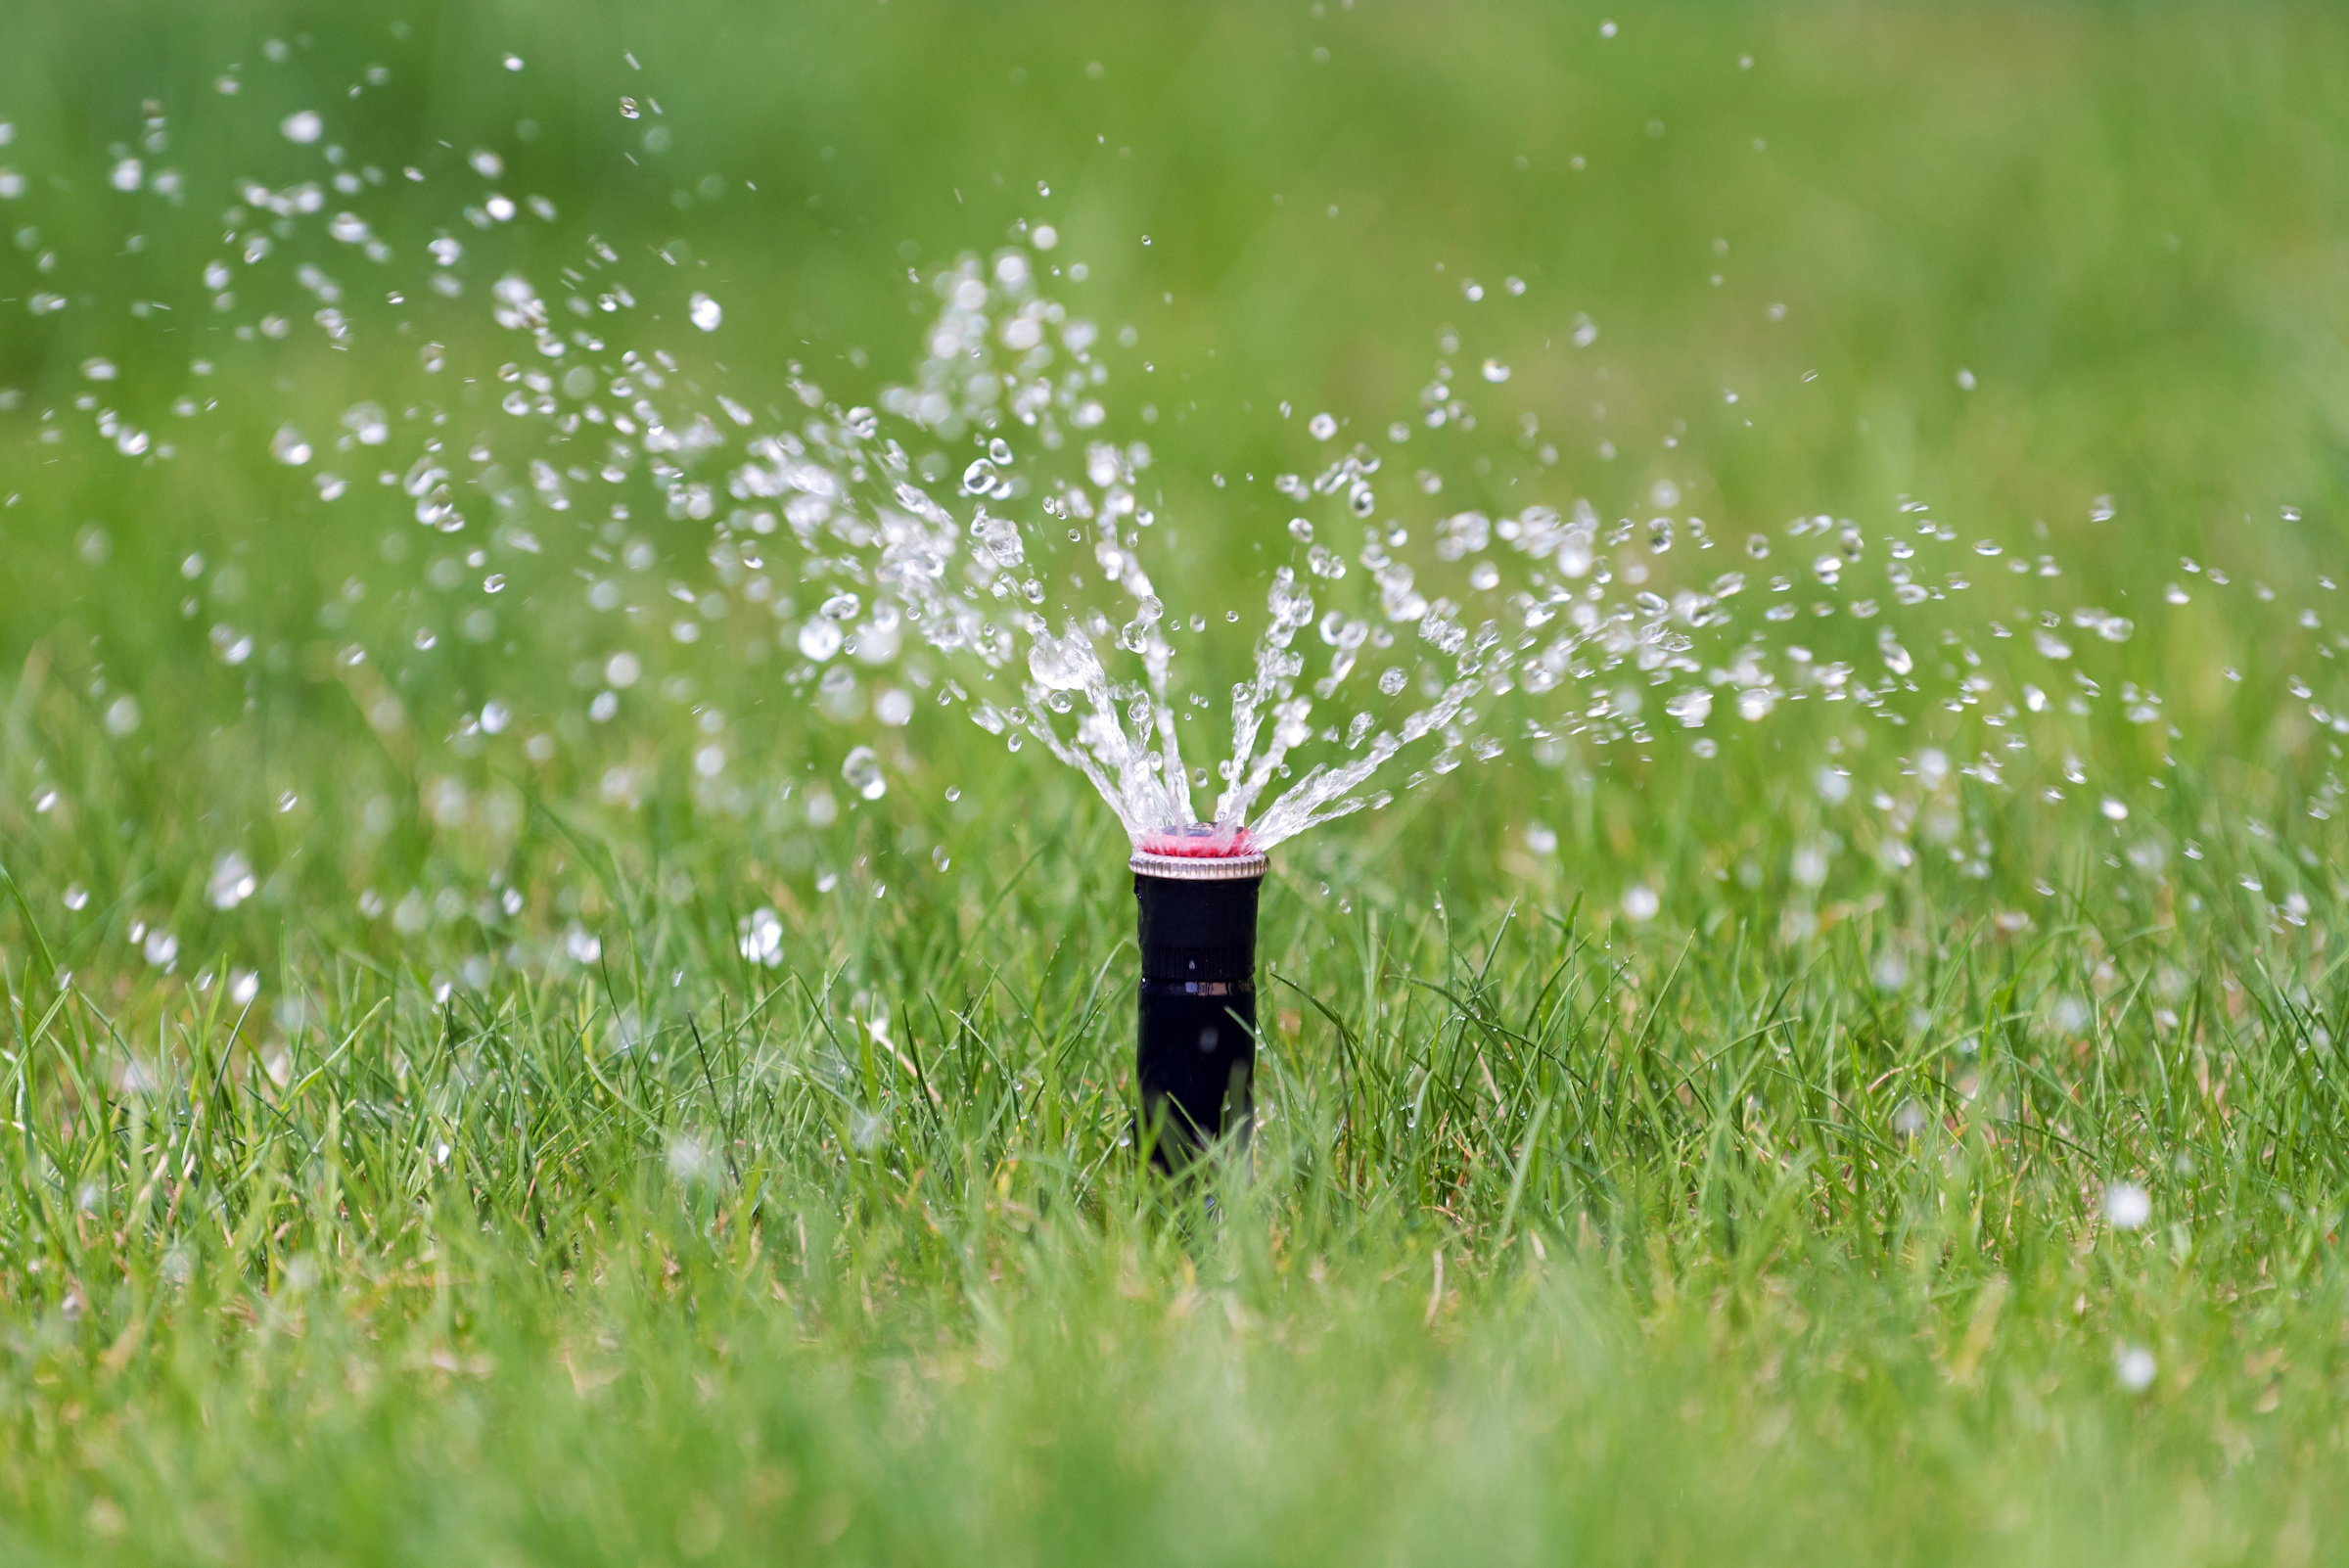 sprinkler-in-action-watering-grass-PXEKAZY.jpg